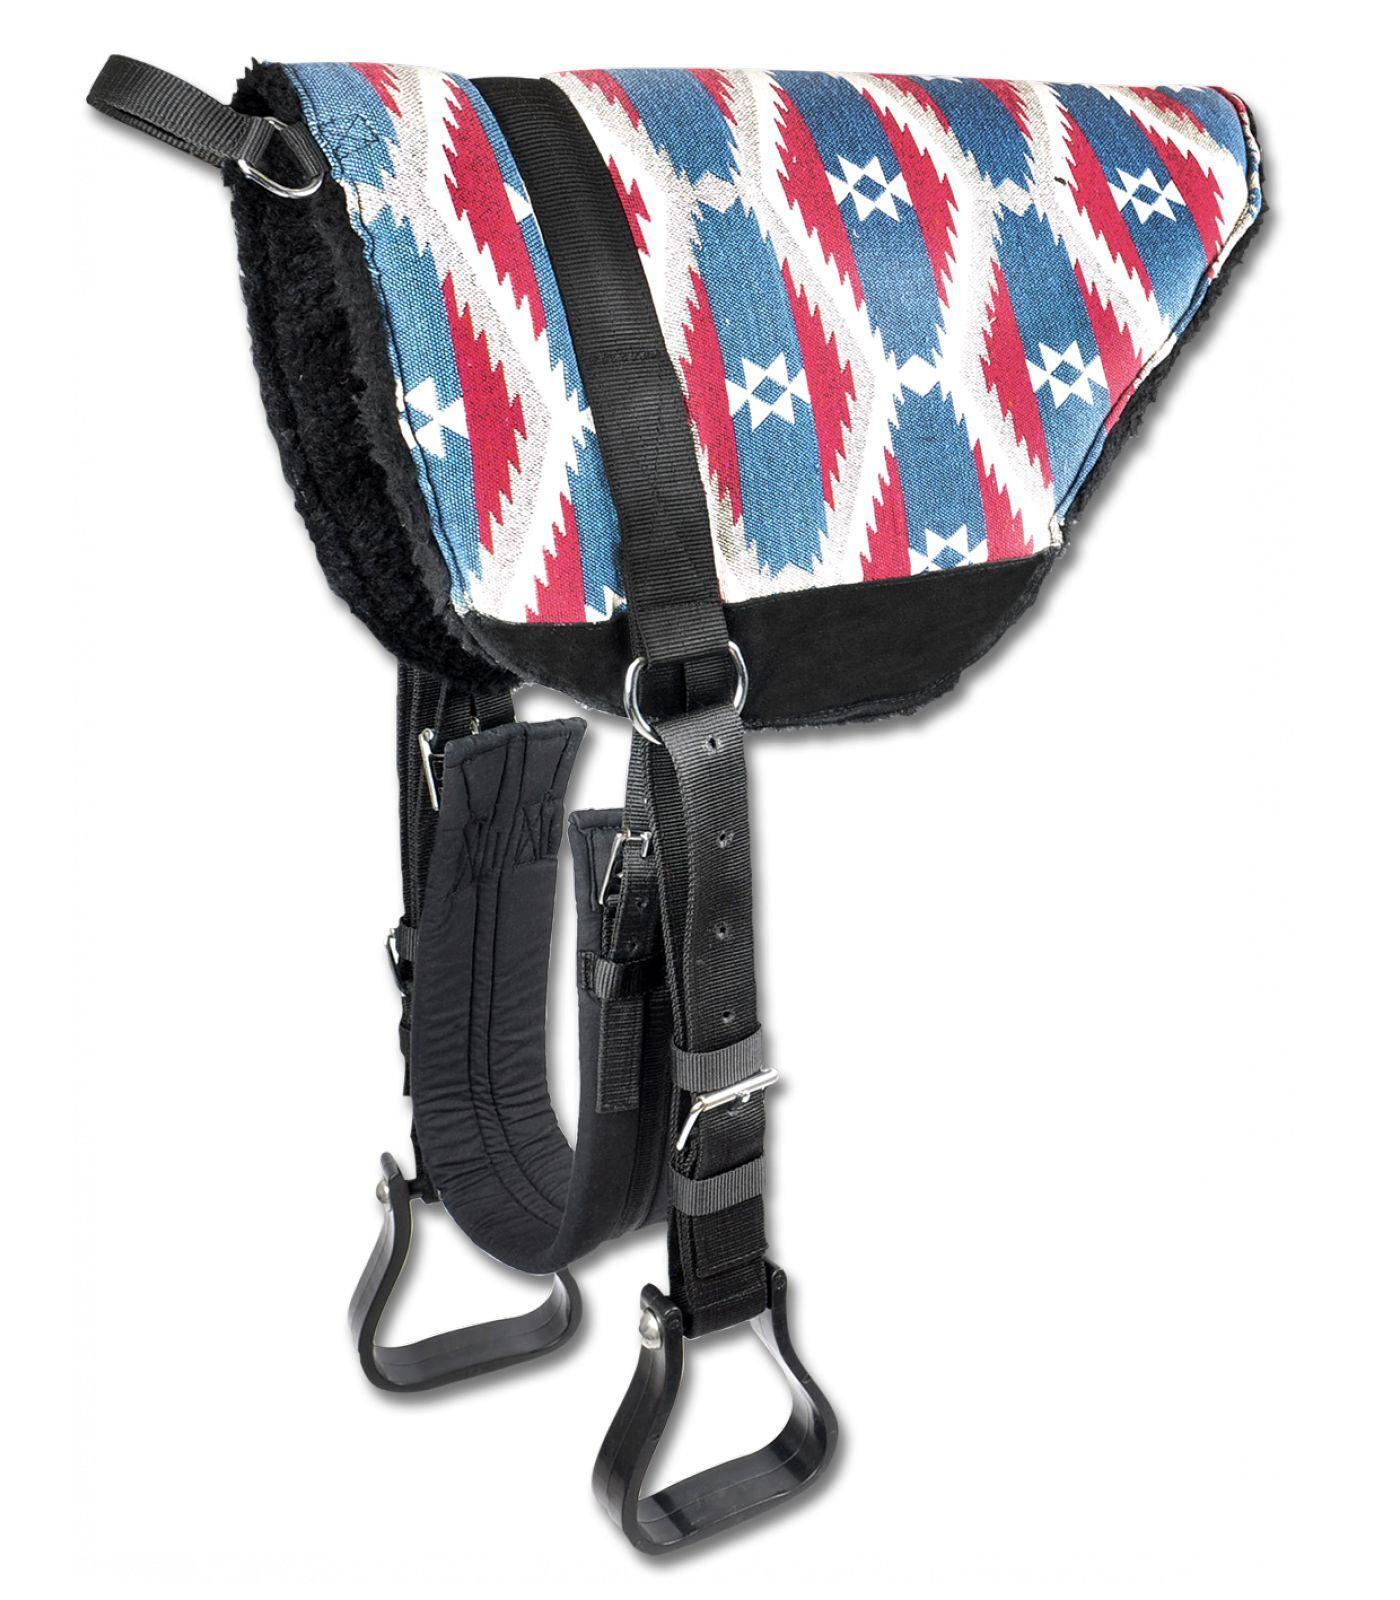 Almohada de caballo,ponyreitkissen,bare-back-pad,Almohadilla asiento con